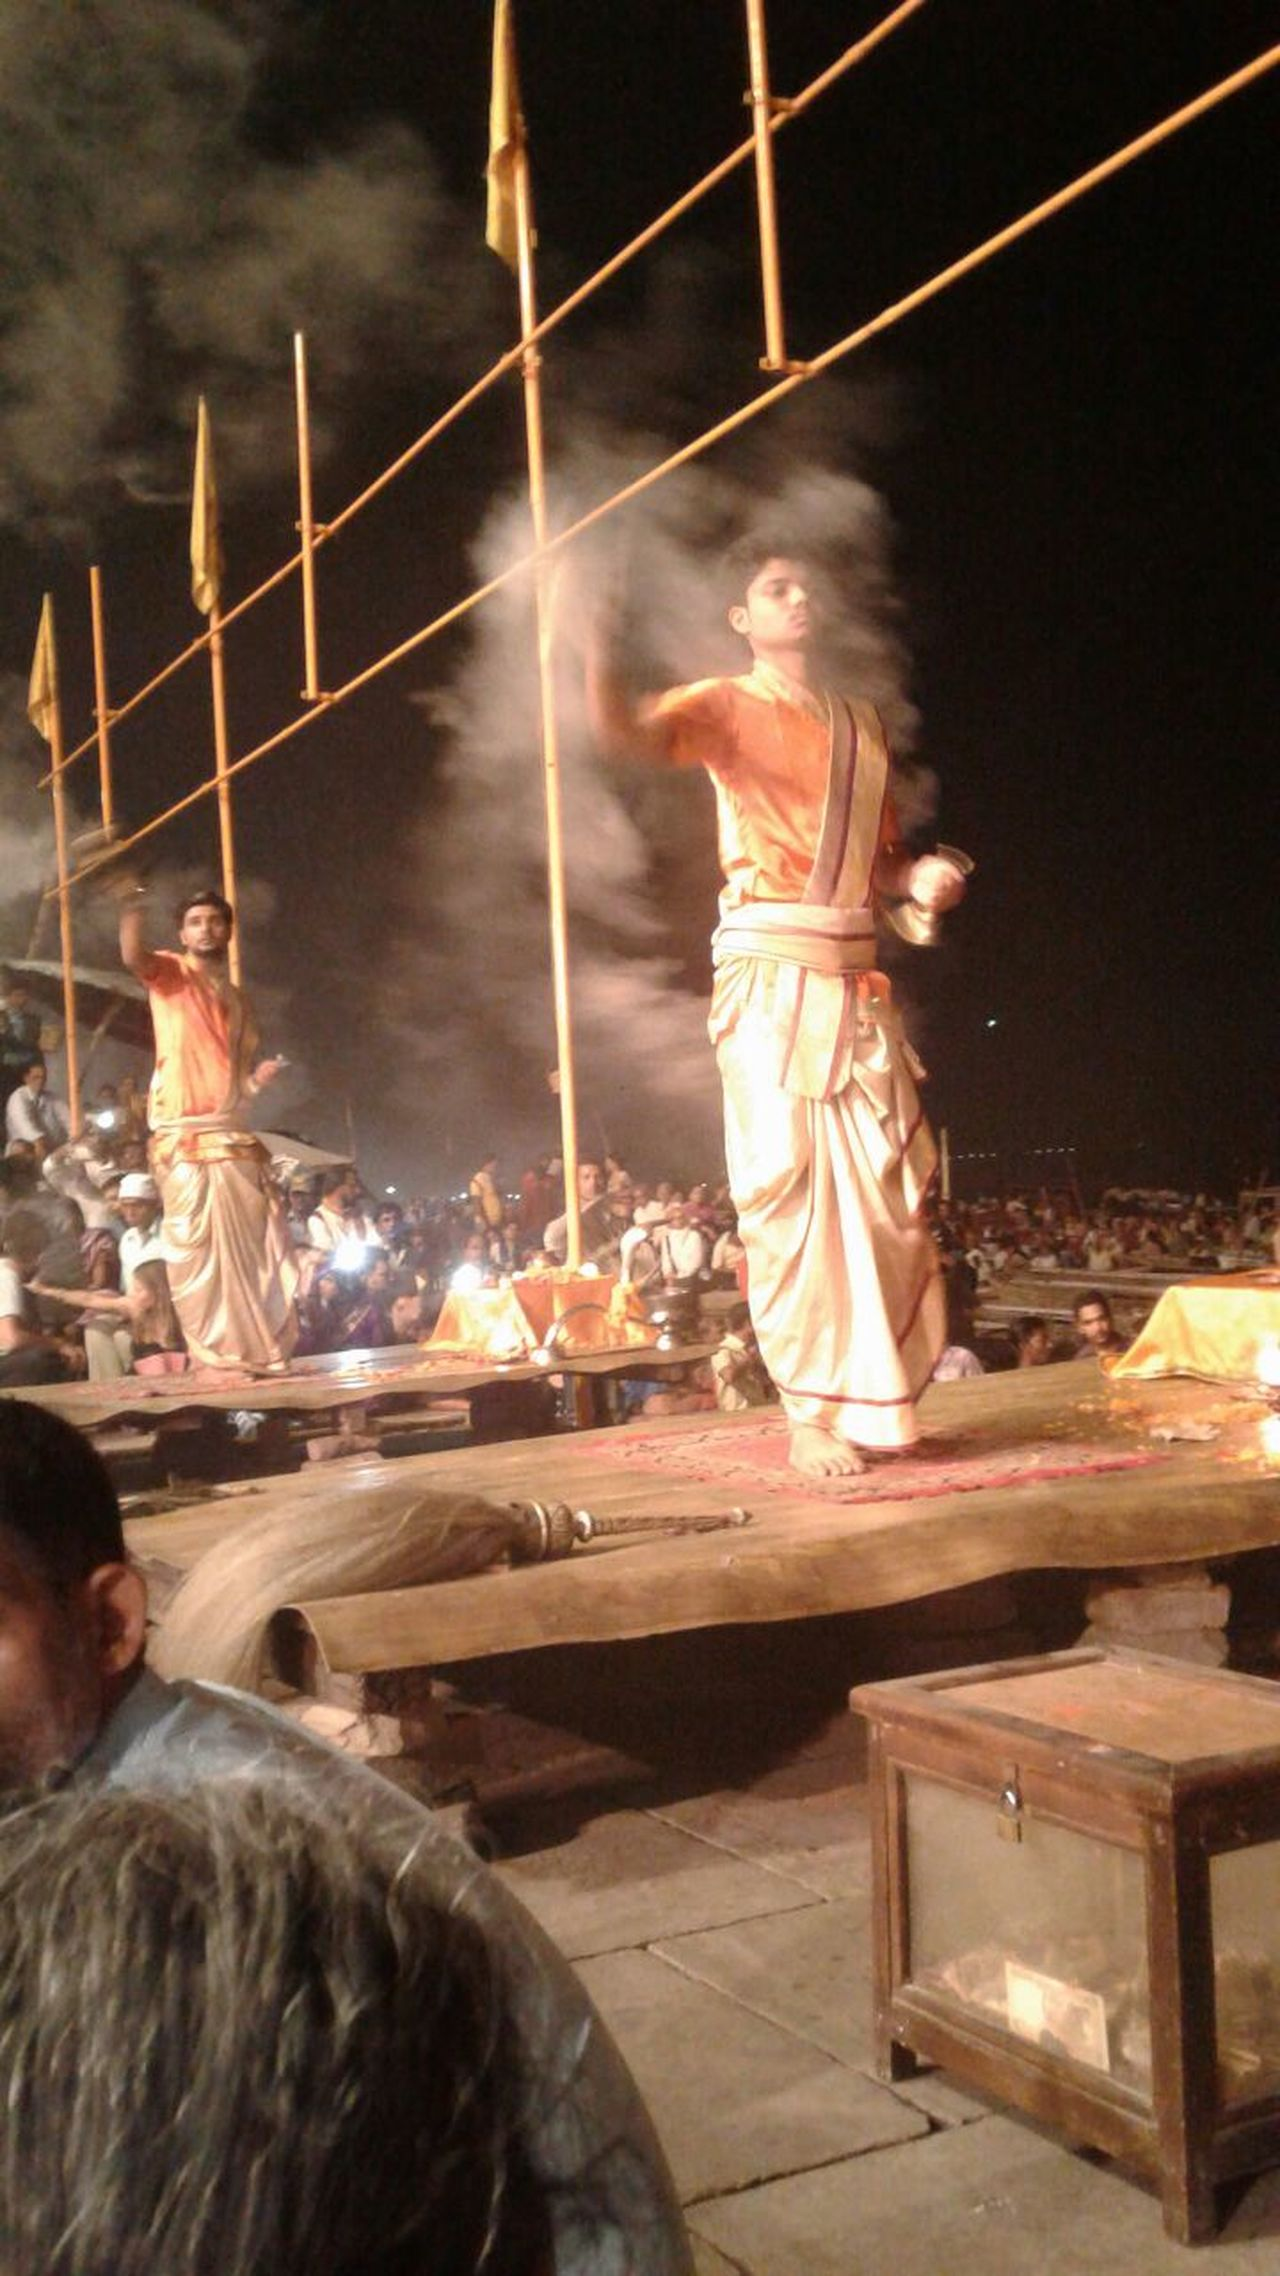 Varanasi, India Ganges, Indian Lifestyle And Culture, Bathing In The Ganges, Varanasi Ghats Flame Arti Flame Burning Puja Prayer Indian Prayer